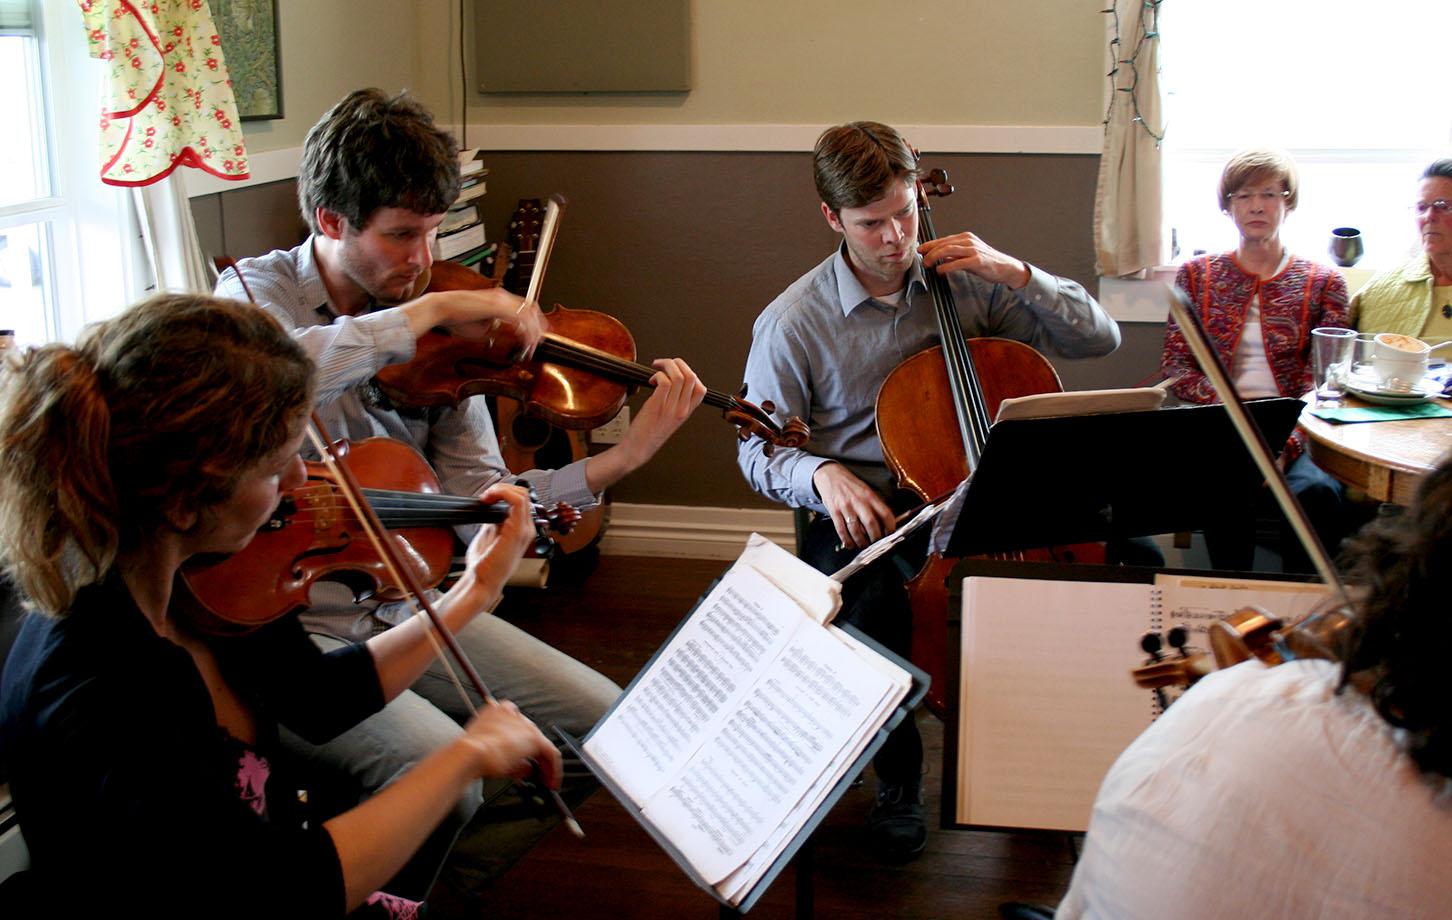 Netherlands quartet perform music of the sea